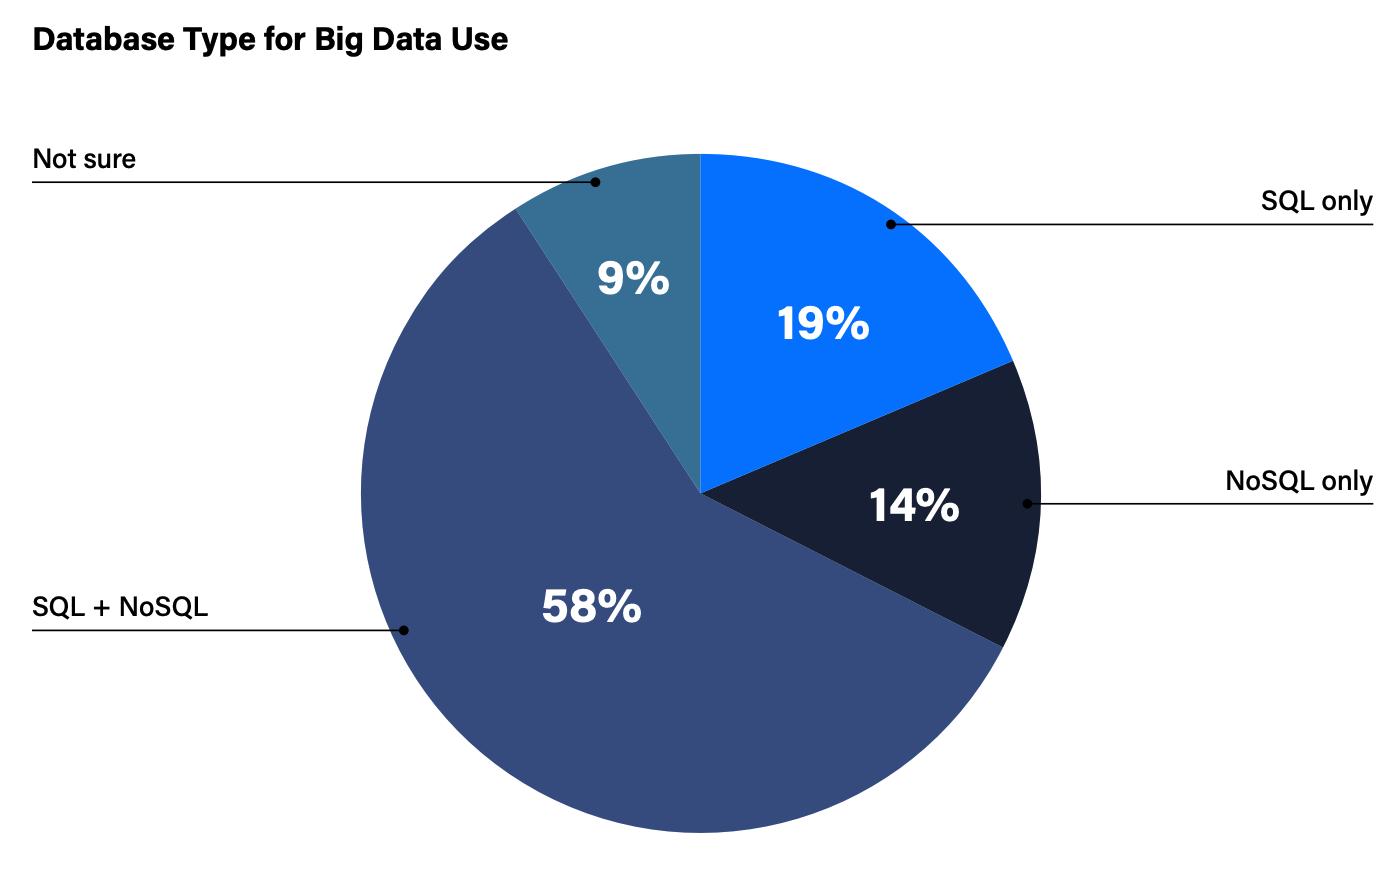 NoSQL vs. NewSQL vs. Distributed SQL: DZone's 2020 Trend Report